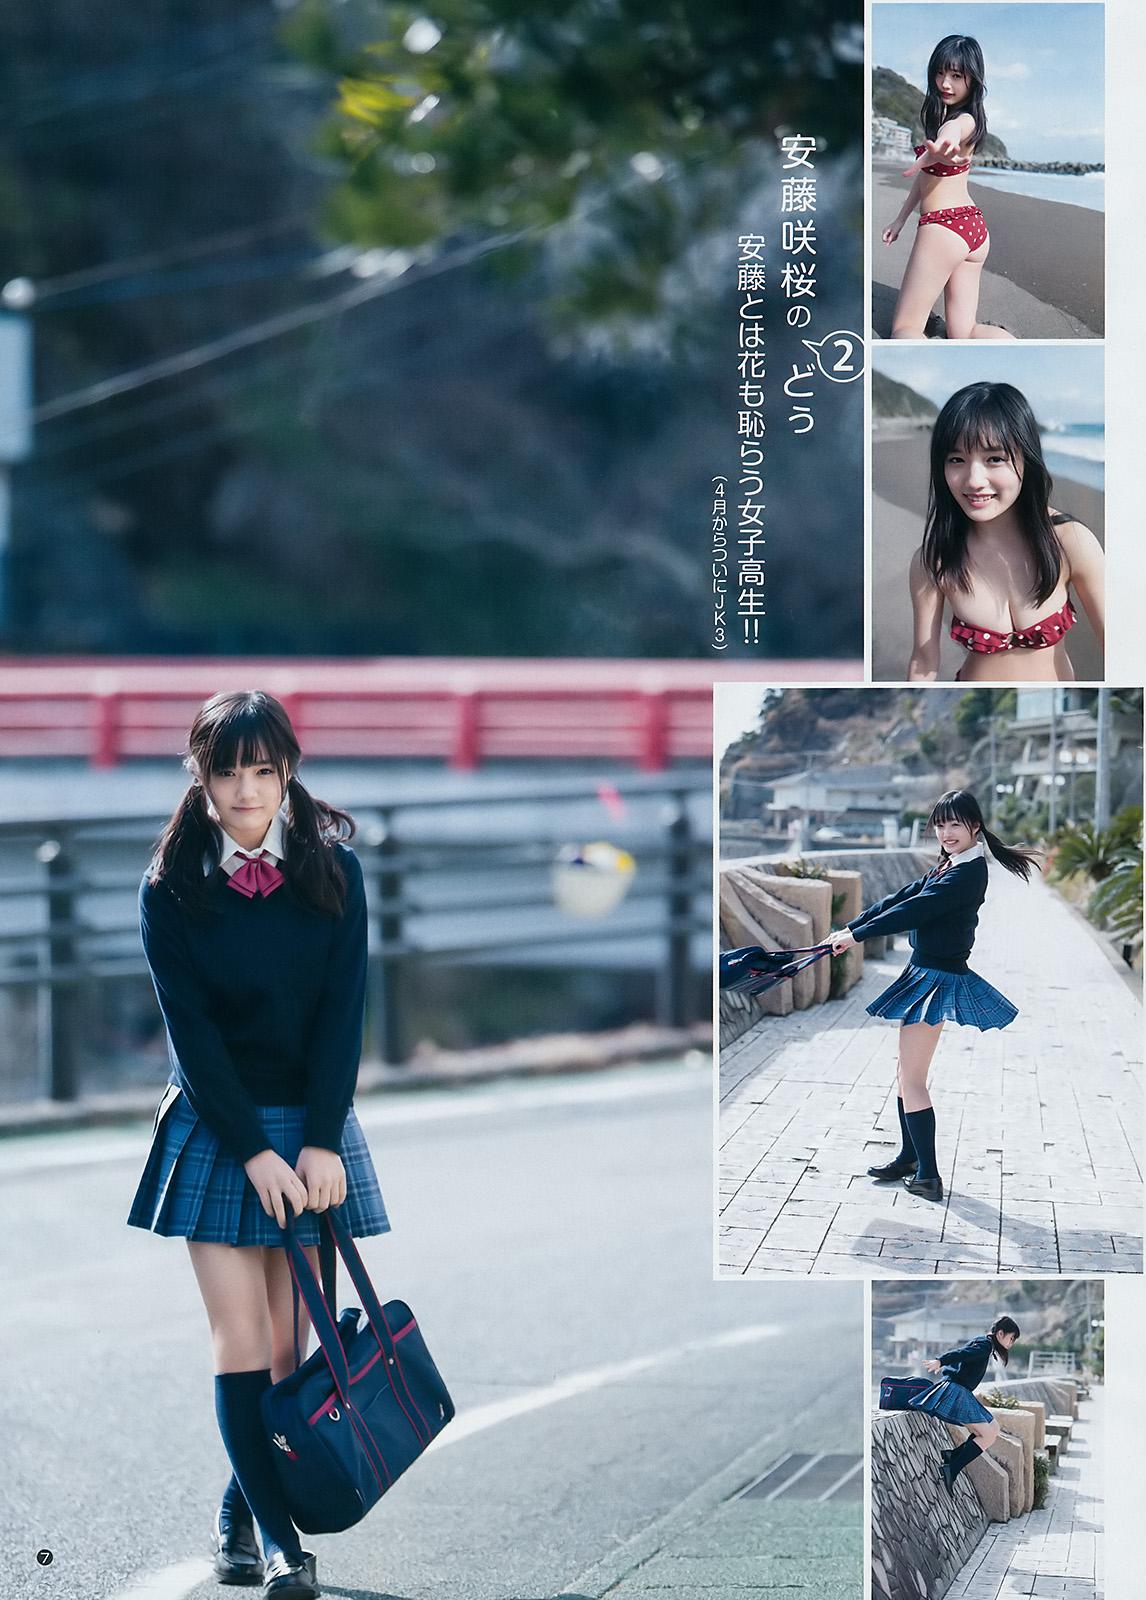 [Young Jump] 2018 No.14 - Japanese Gravure Idol Young Jump Wakatsuki Yumi Sakura Ando Ma Chia-Ling Japanese Girls Japanese gravure